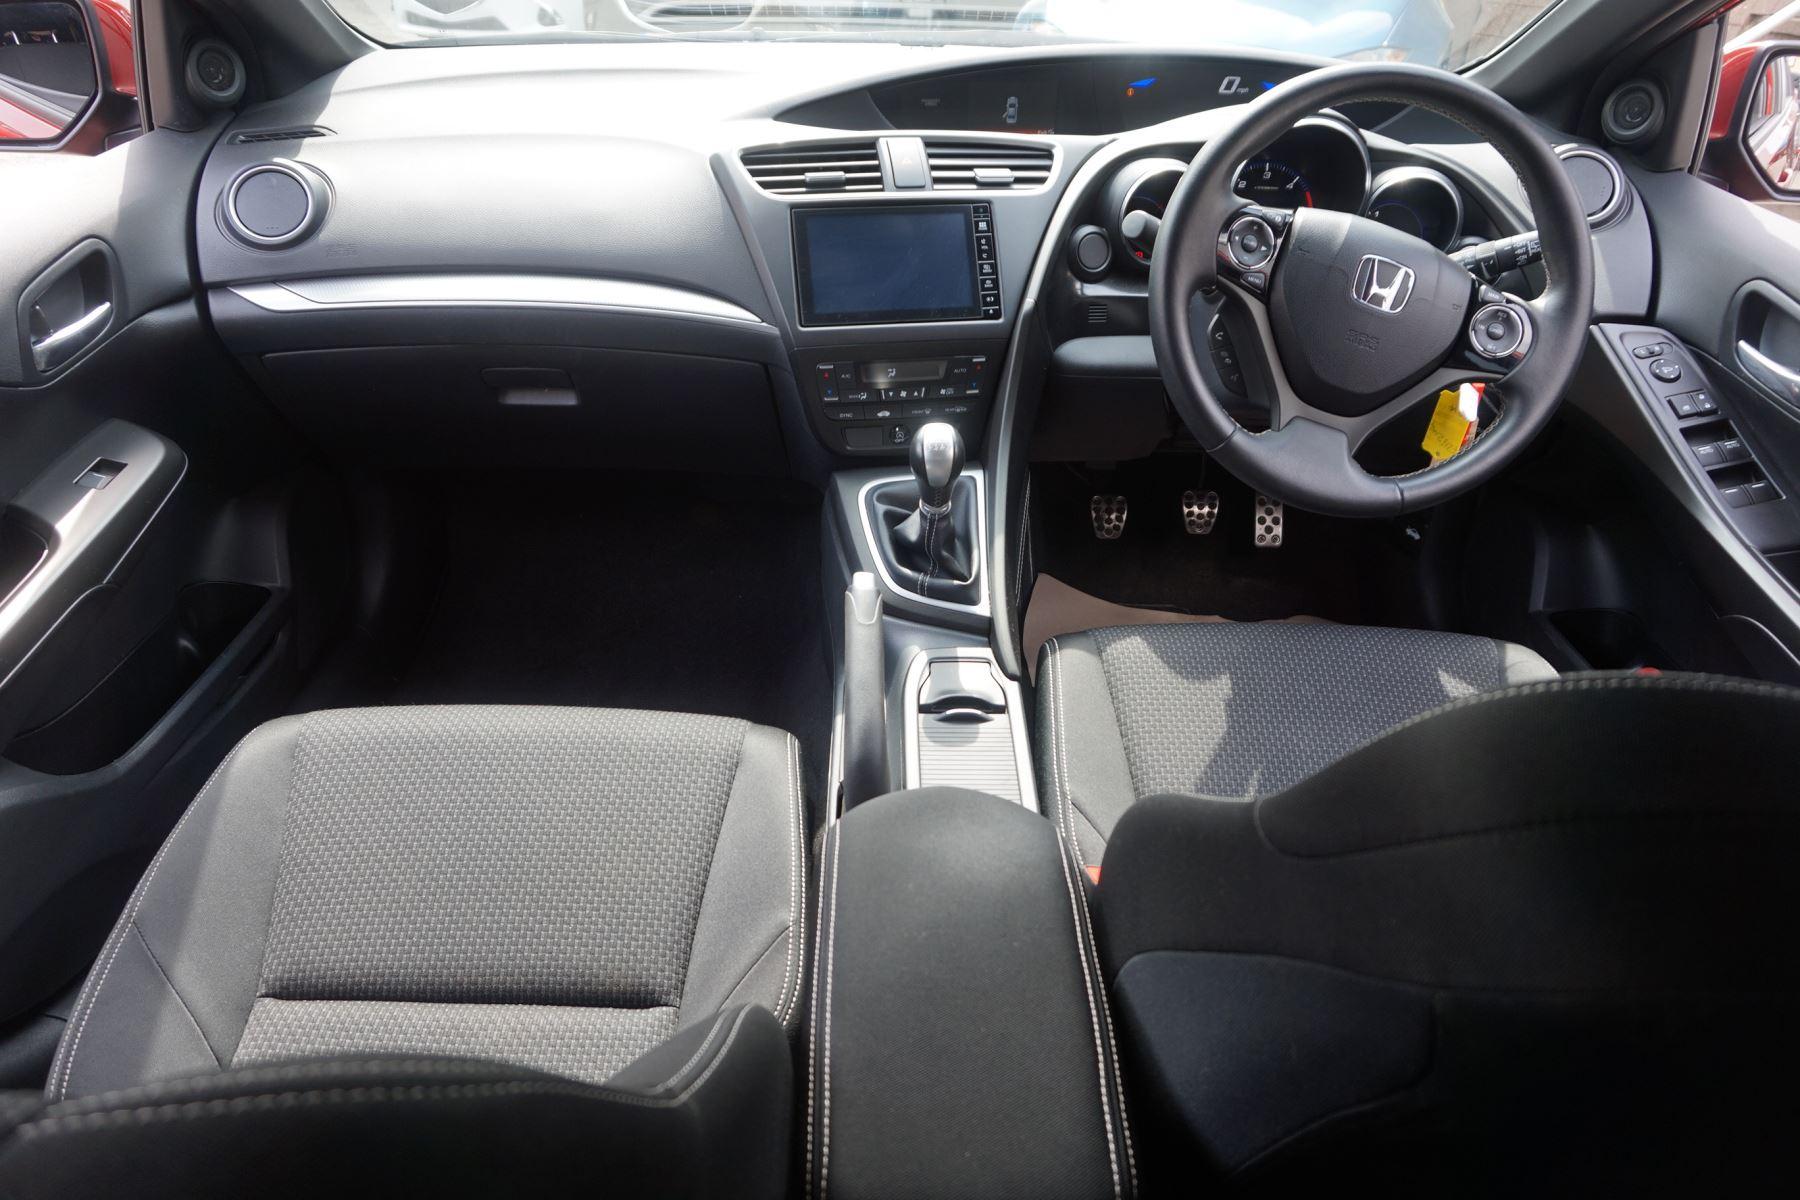 Honda Civic 1.6 i-DTEC Sport [Nav] image 10